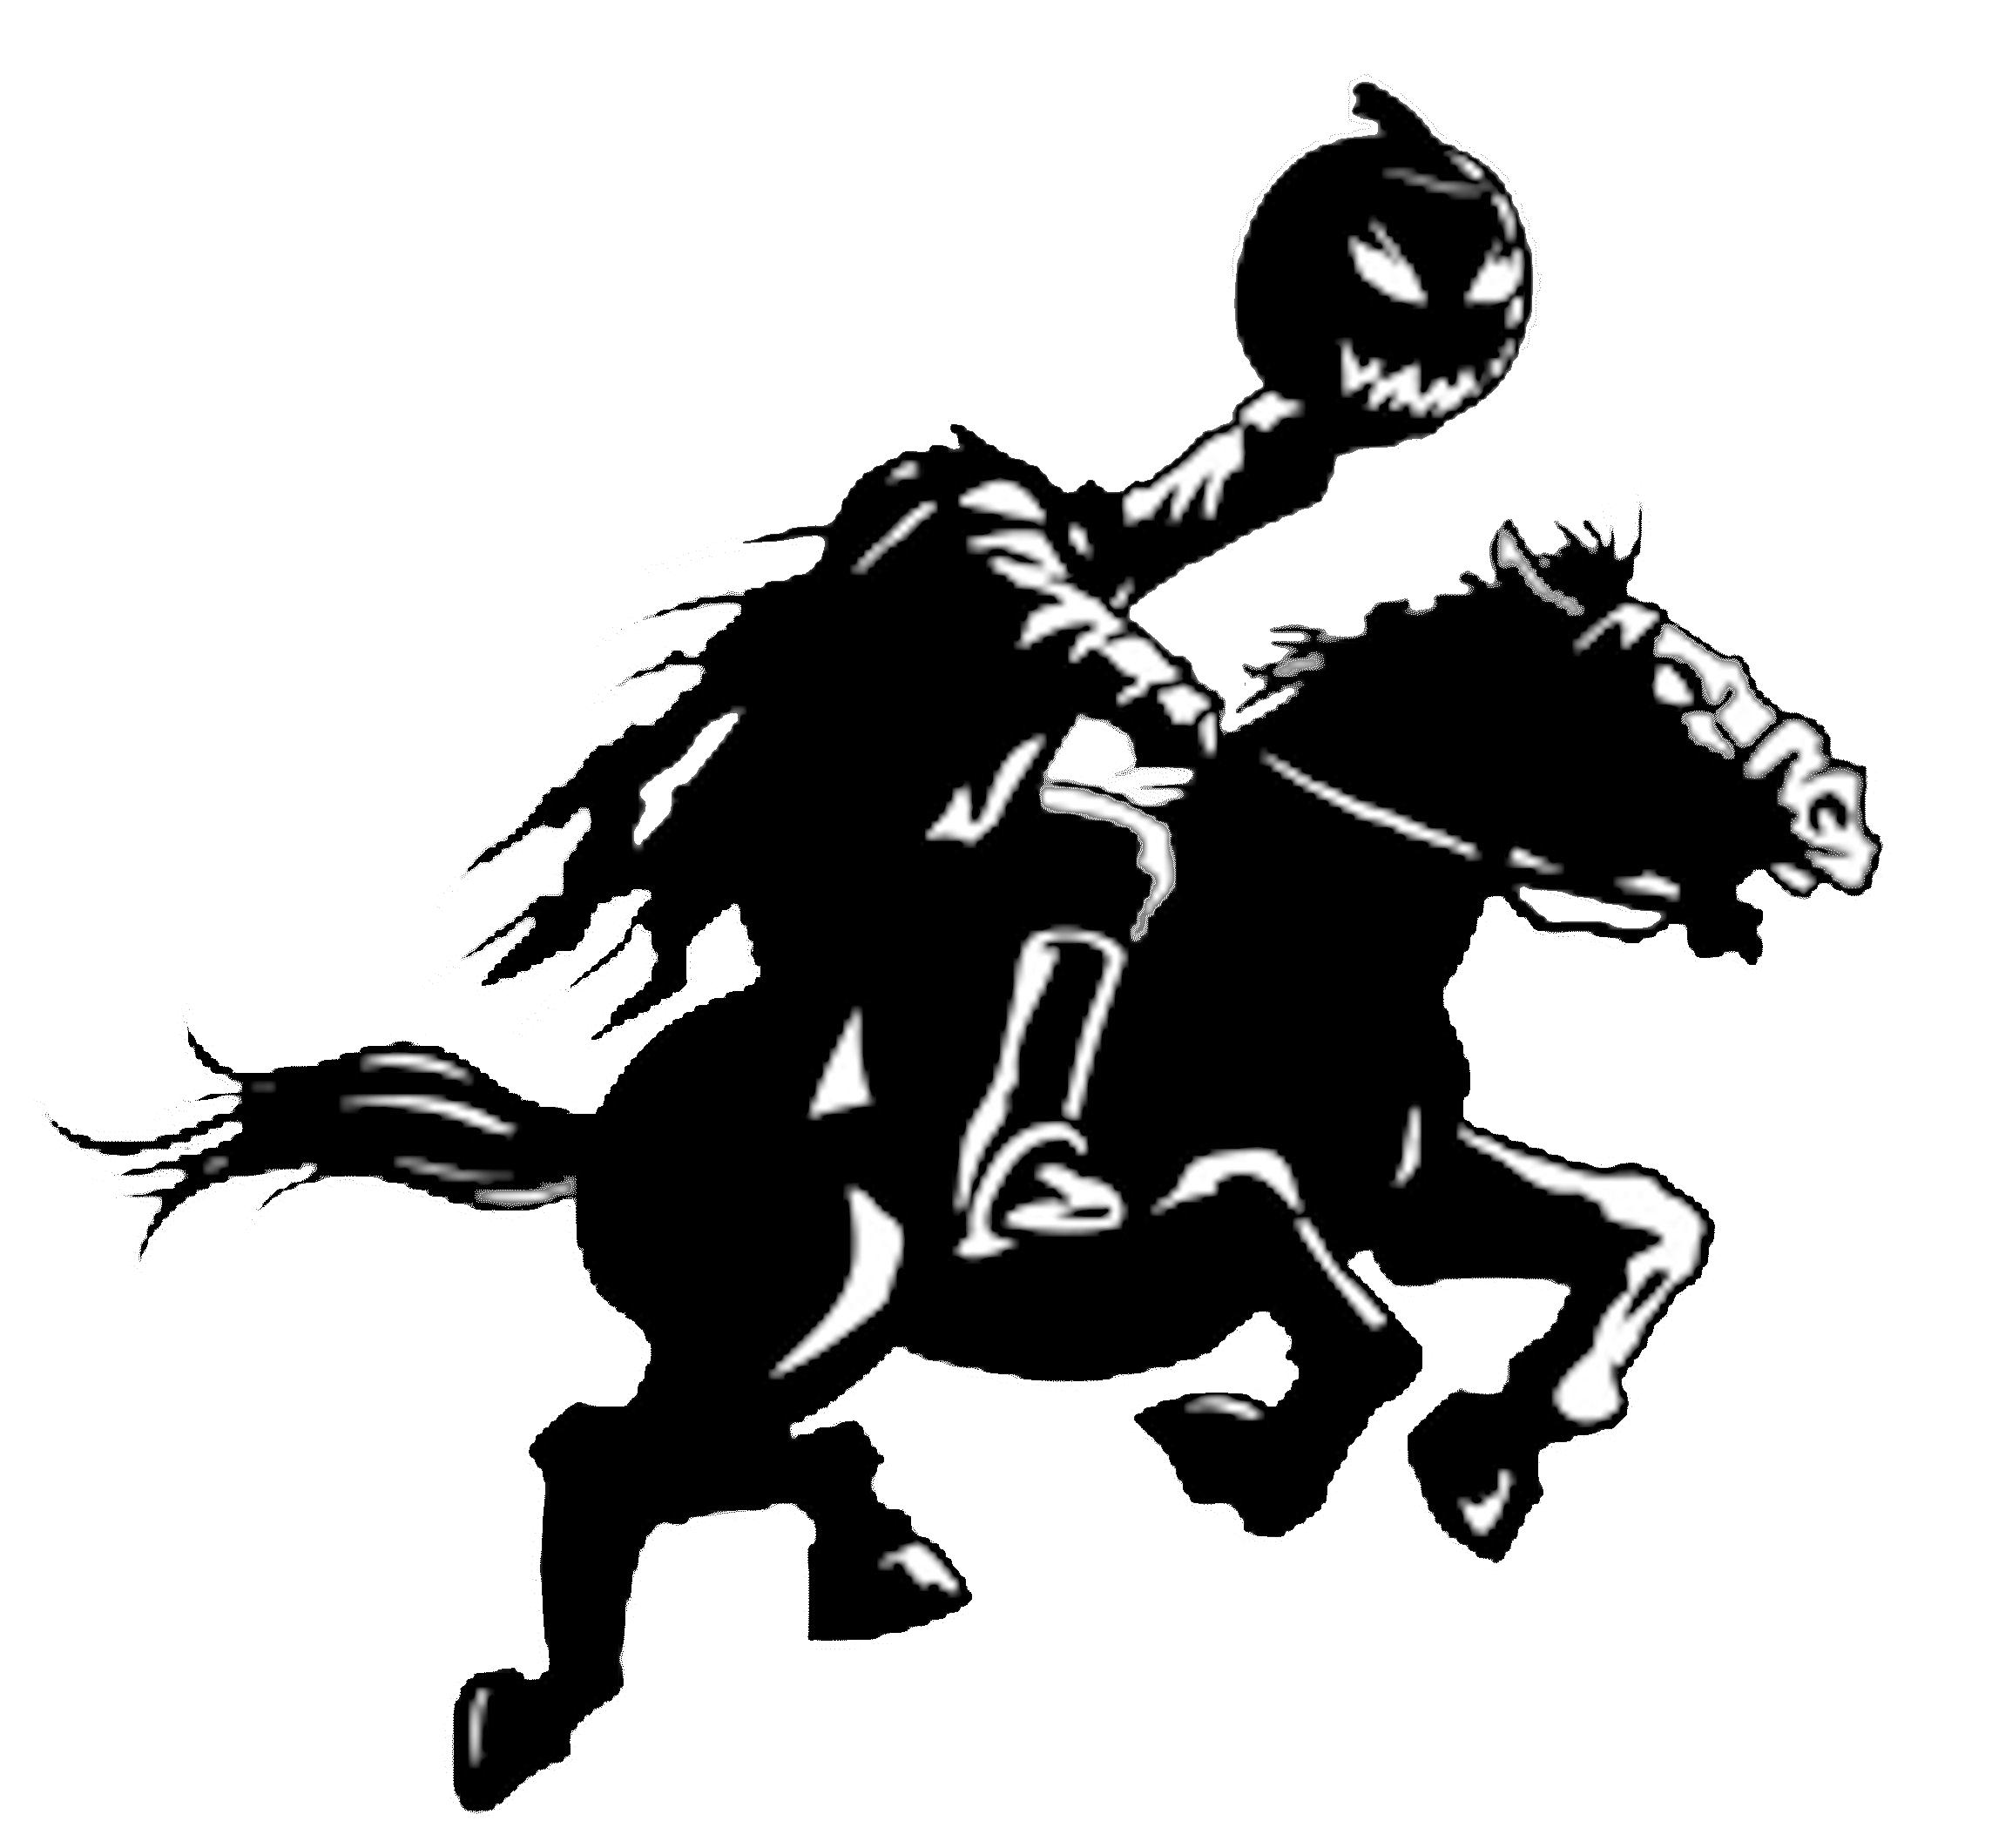 13479347941119929214headles horsemen logo cut.png 2,287